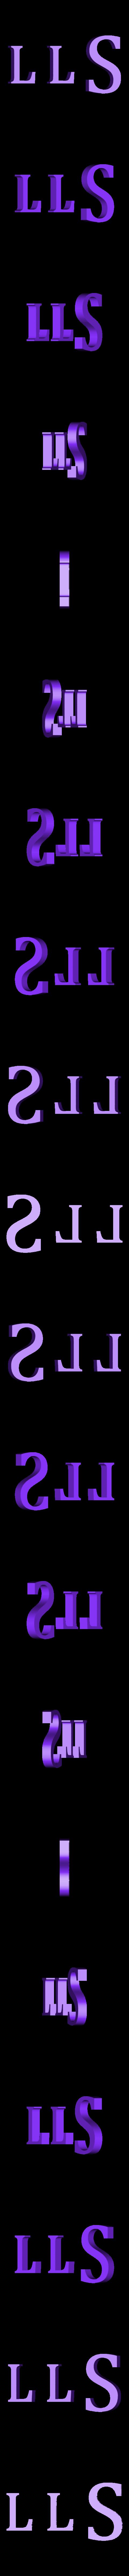 Break_LLS_01.stl Download free STL file The Magicians - Brakebills University Logo • 3D printing template, SYFY